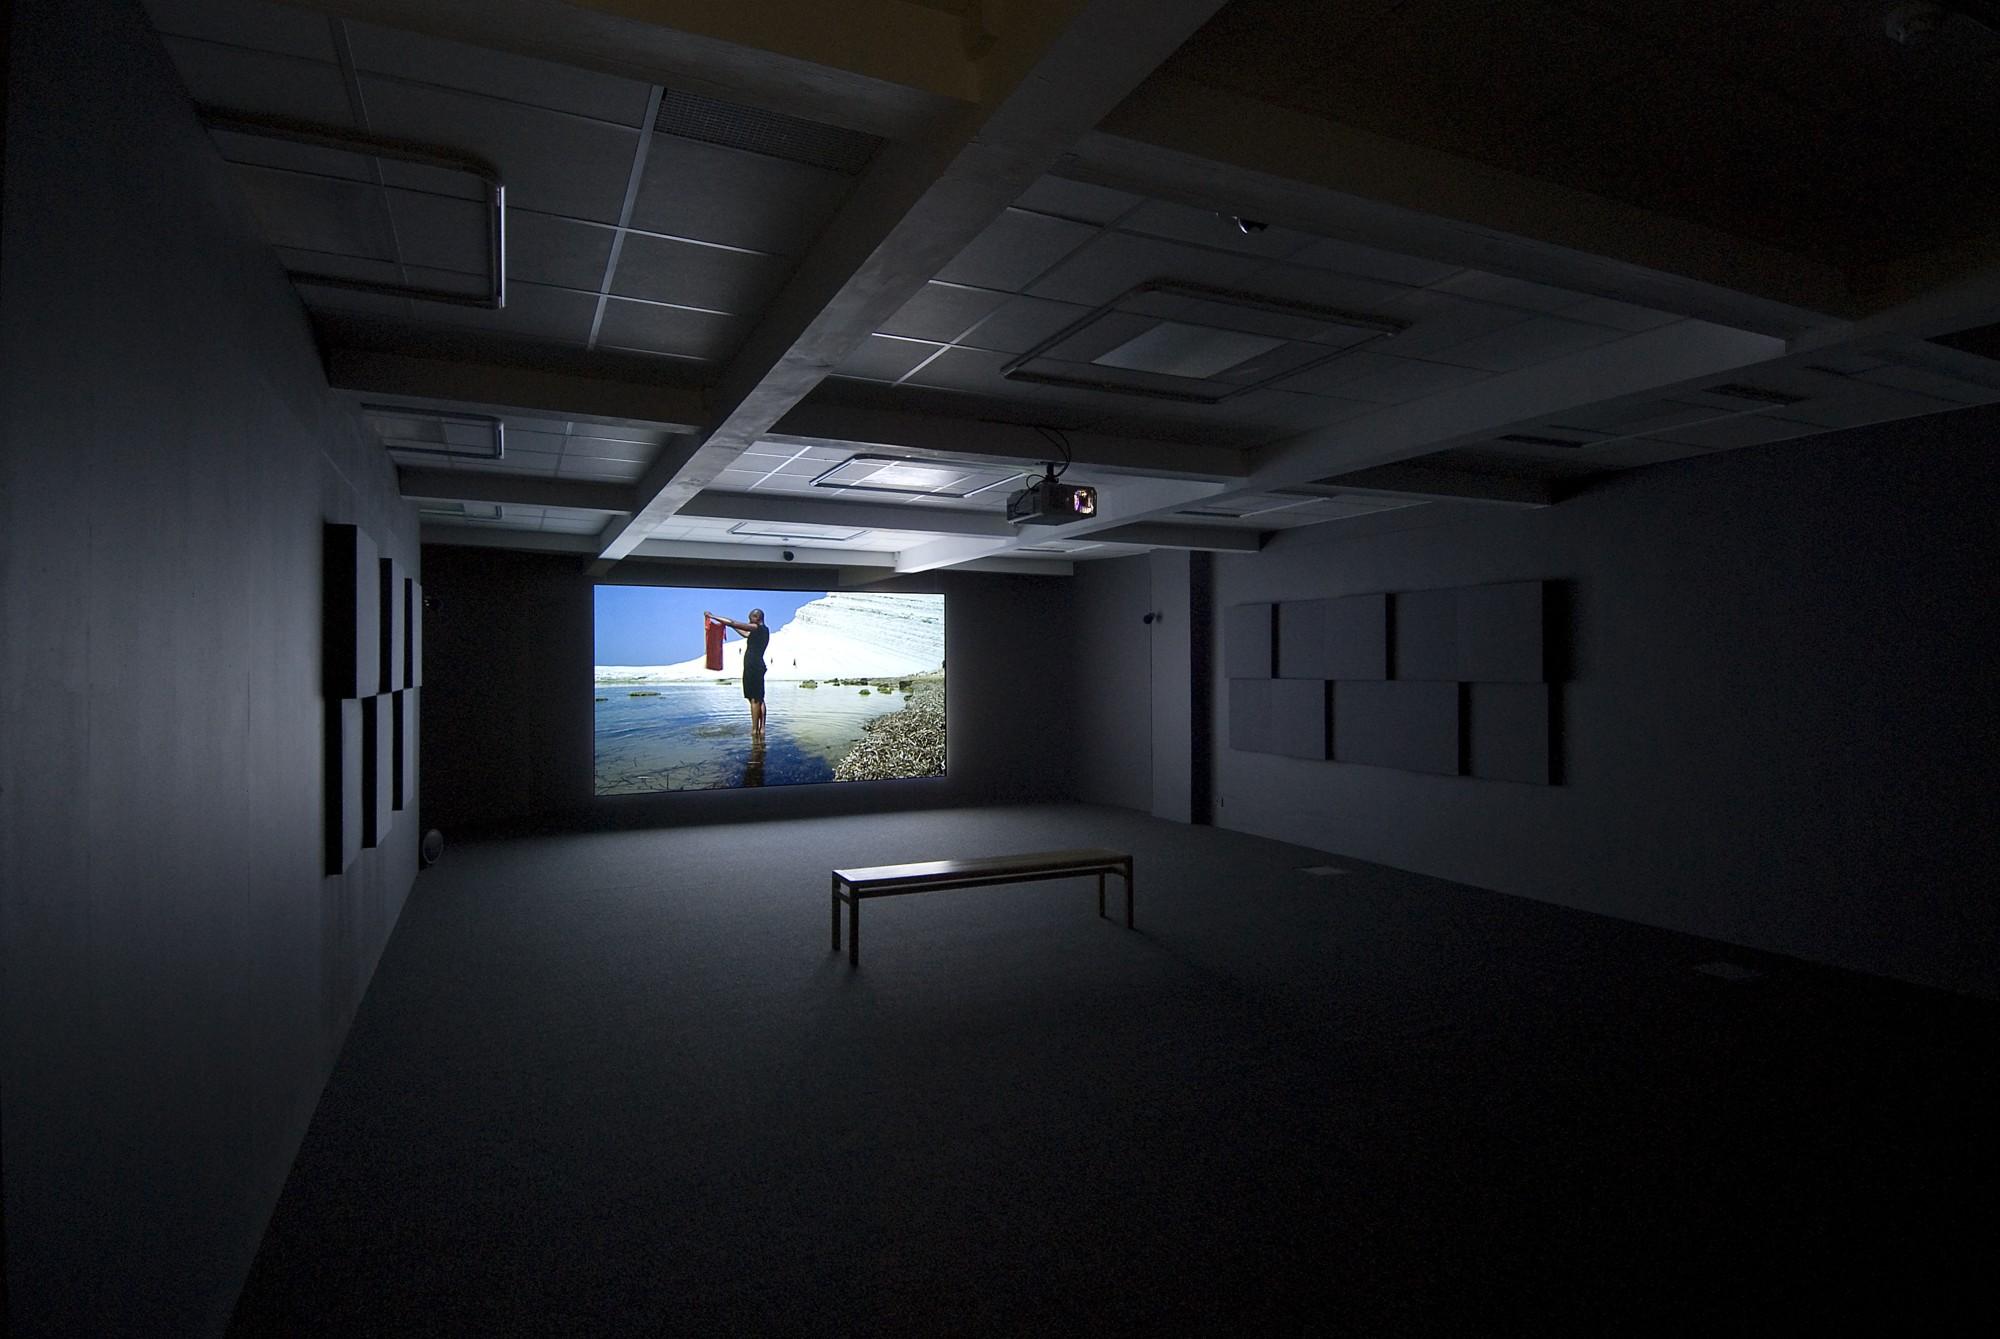 Ship to Shore: Art and Lure of the Sea. John Hansard Gallery, Southampton, 2014